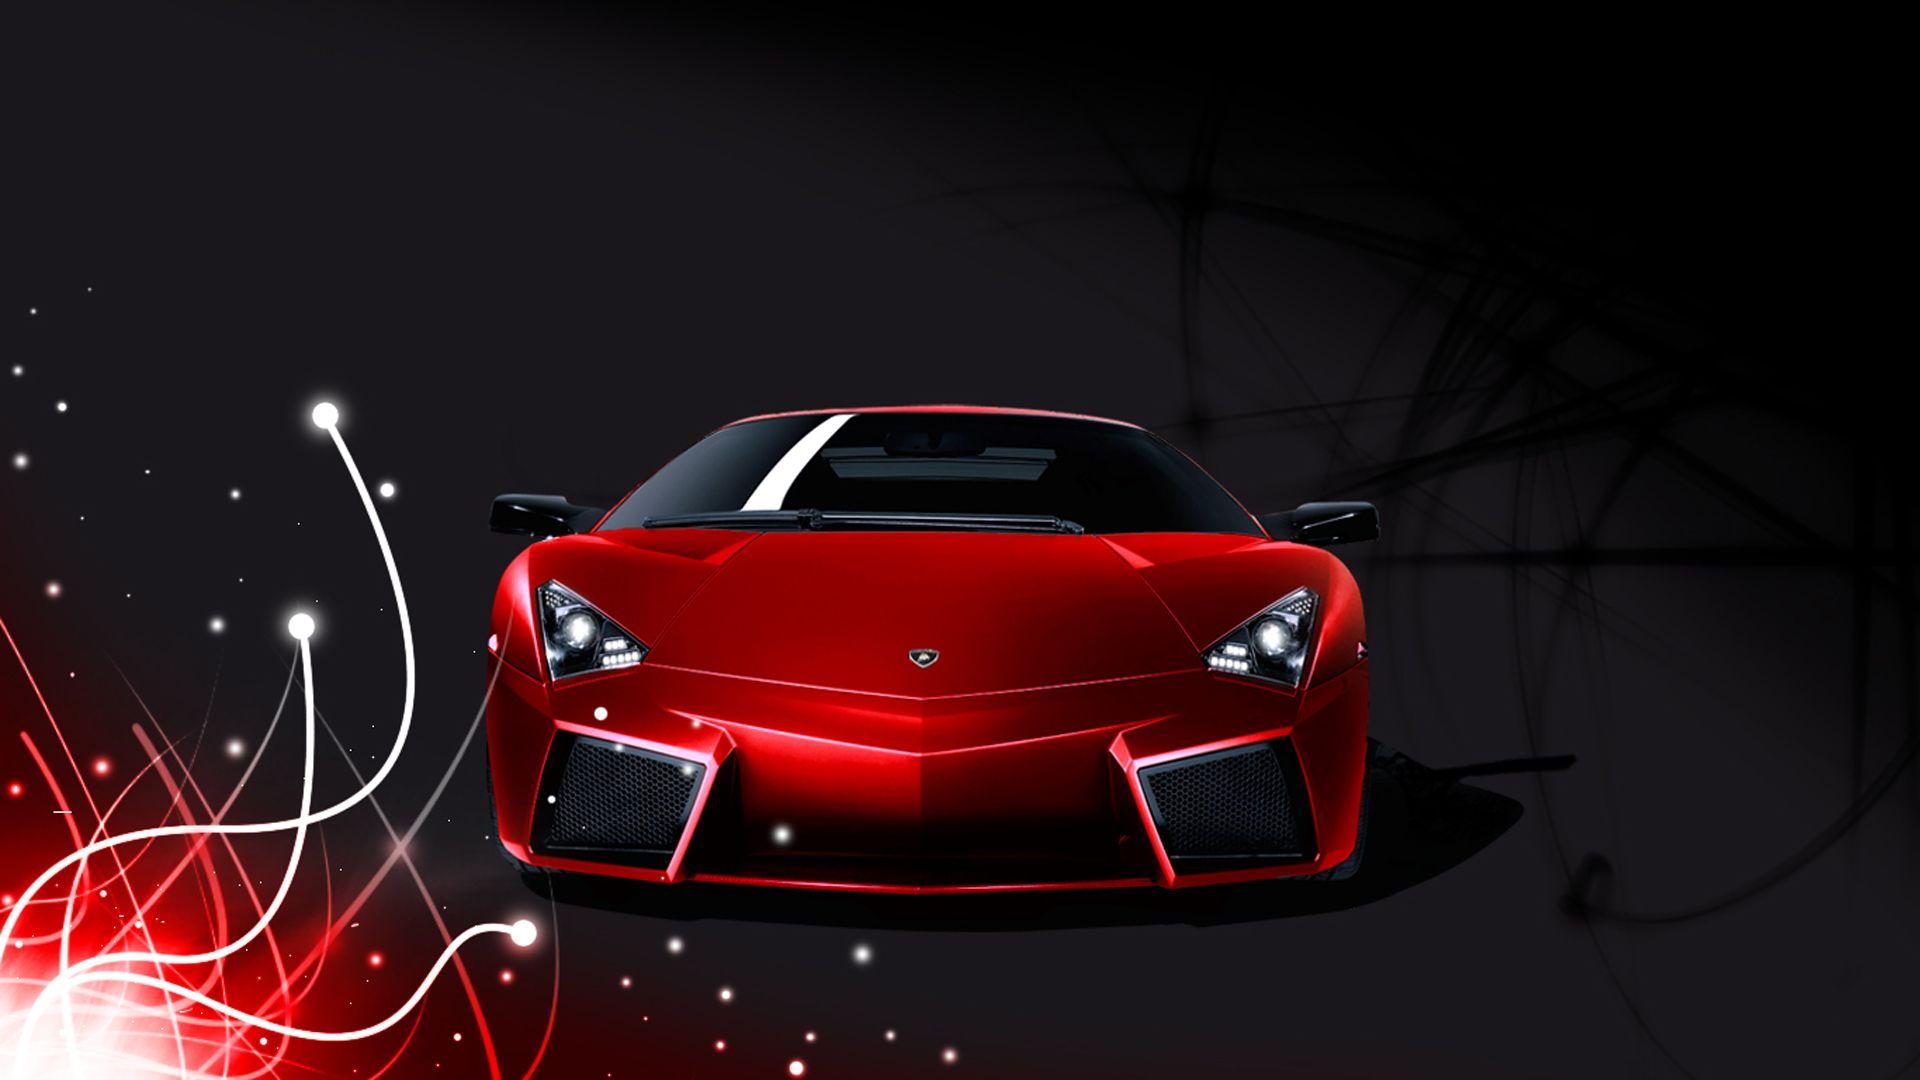 Lamborghini Red, Pictures Of Lambo Black Red